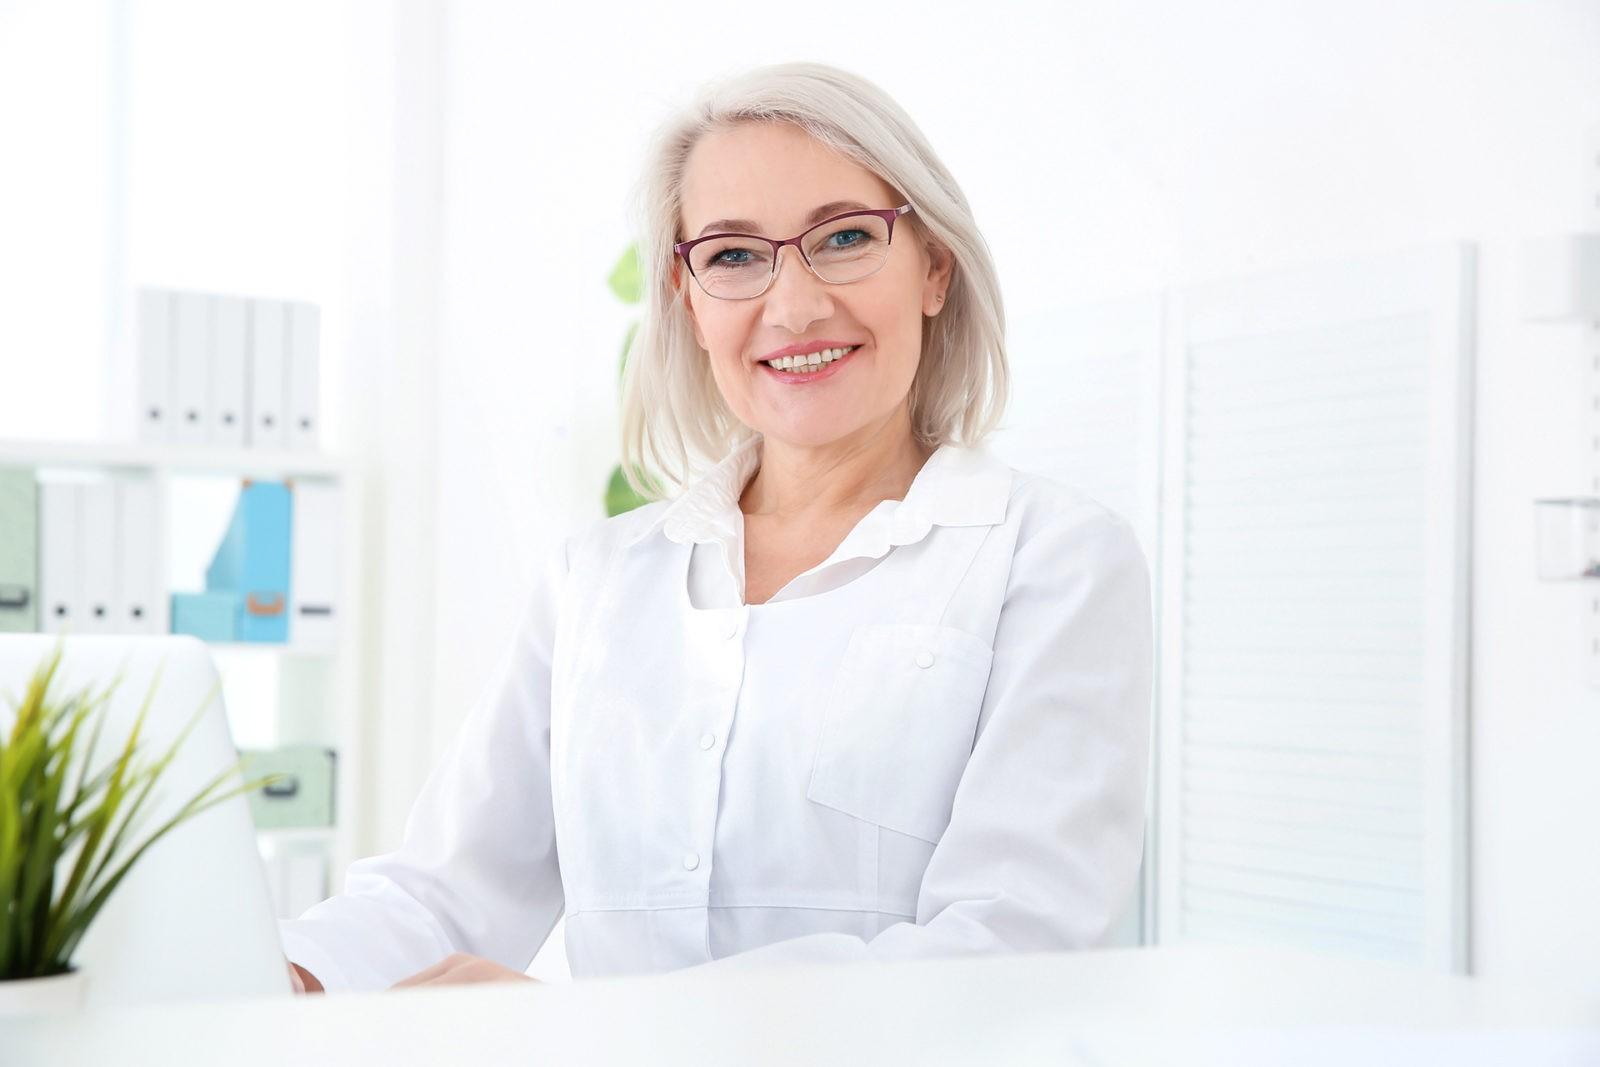 Senior female receptionist working in hospital